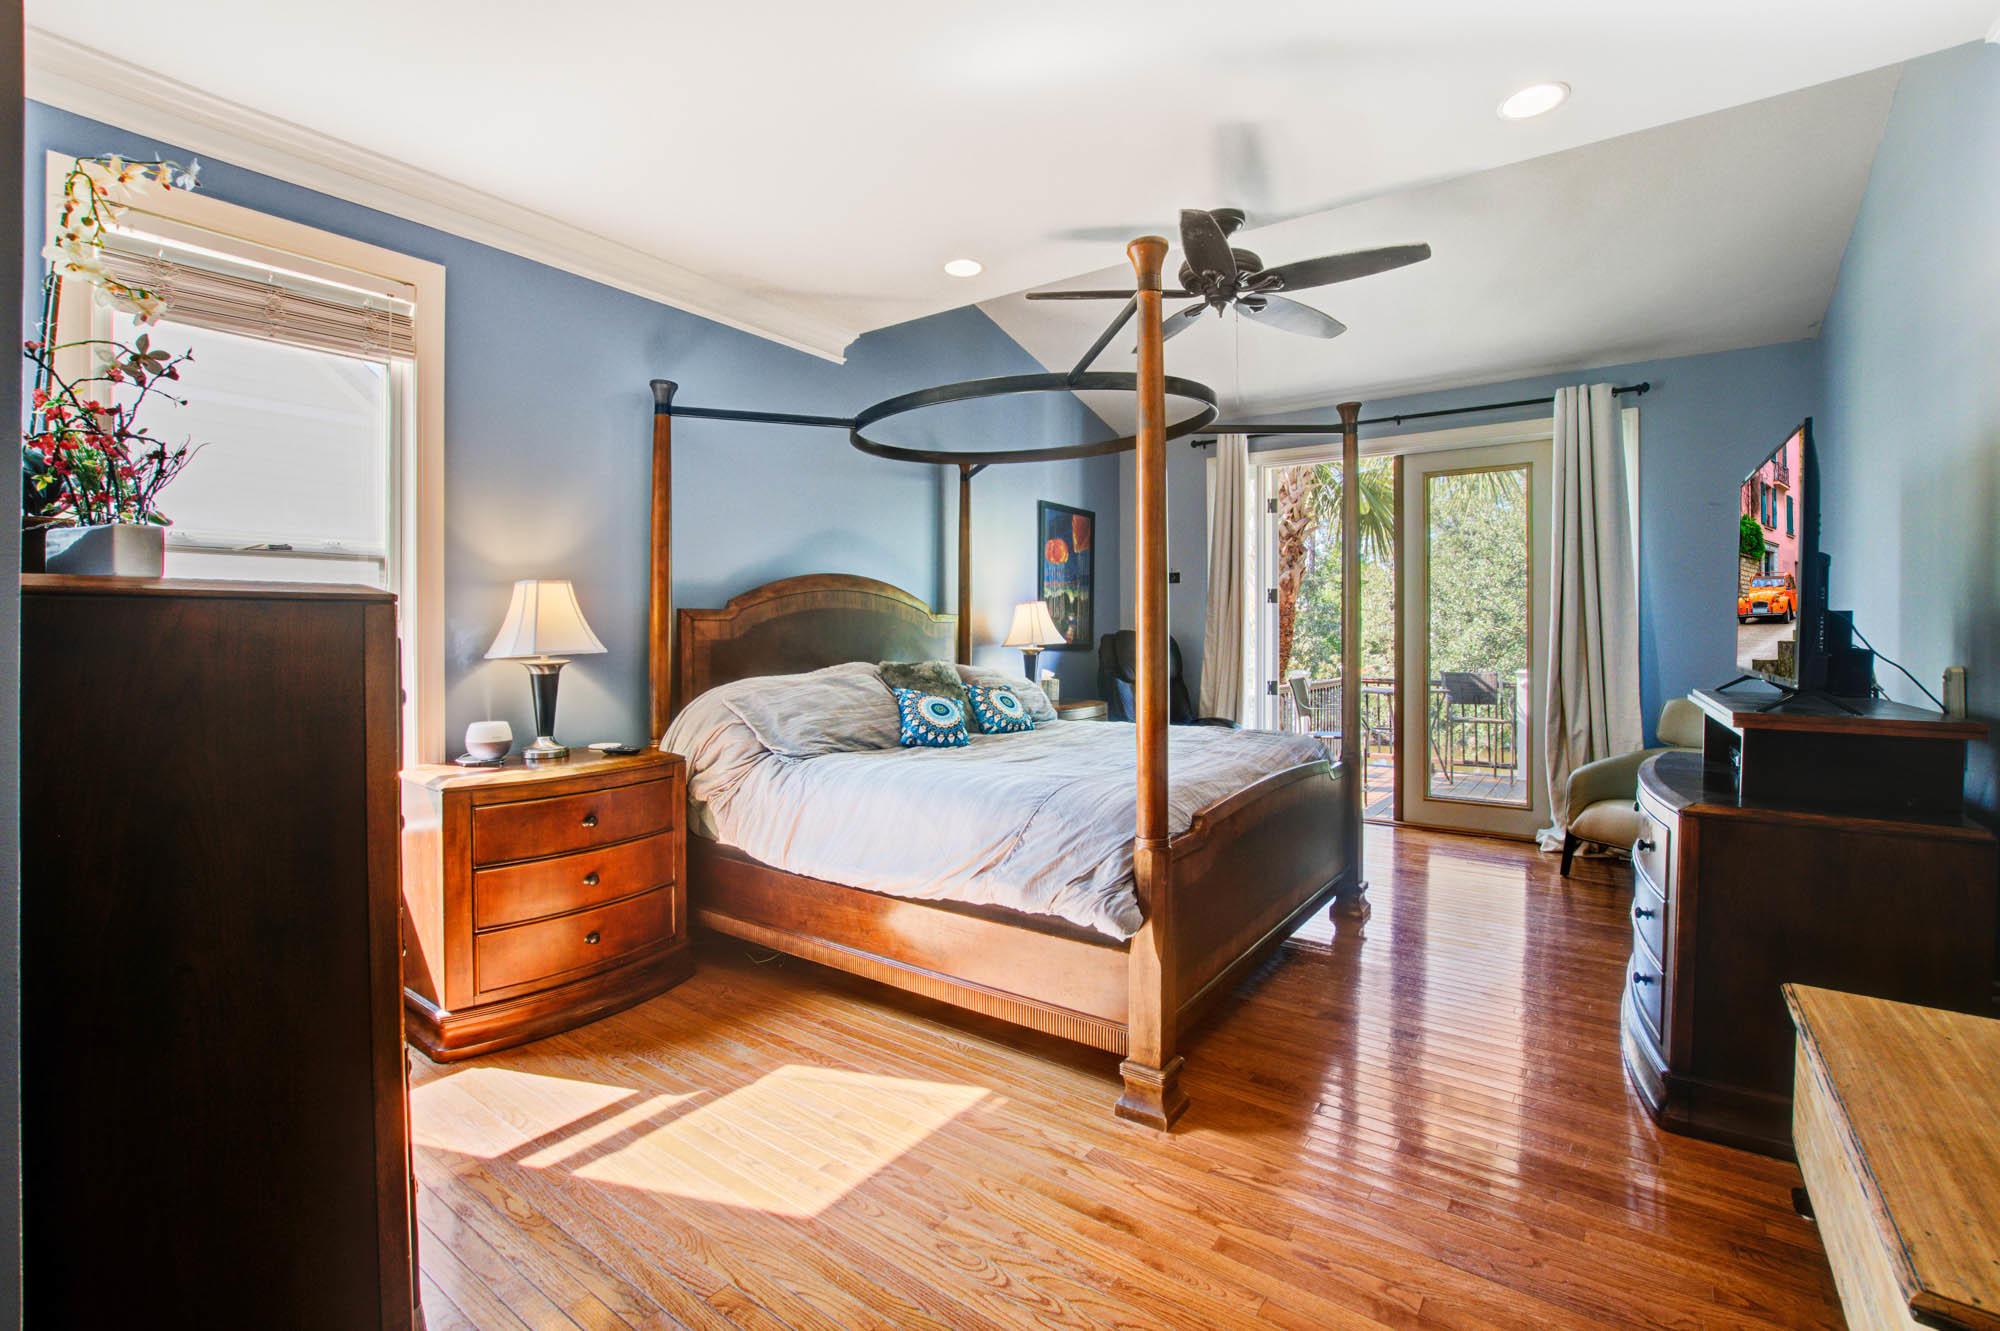 St Thomas Point Homes For Sale - 307 Jamesbury, Charleston, SC - 23